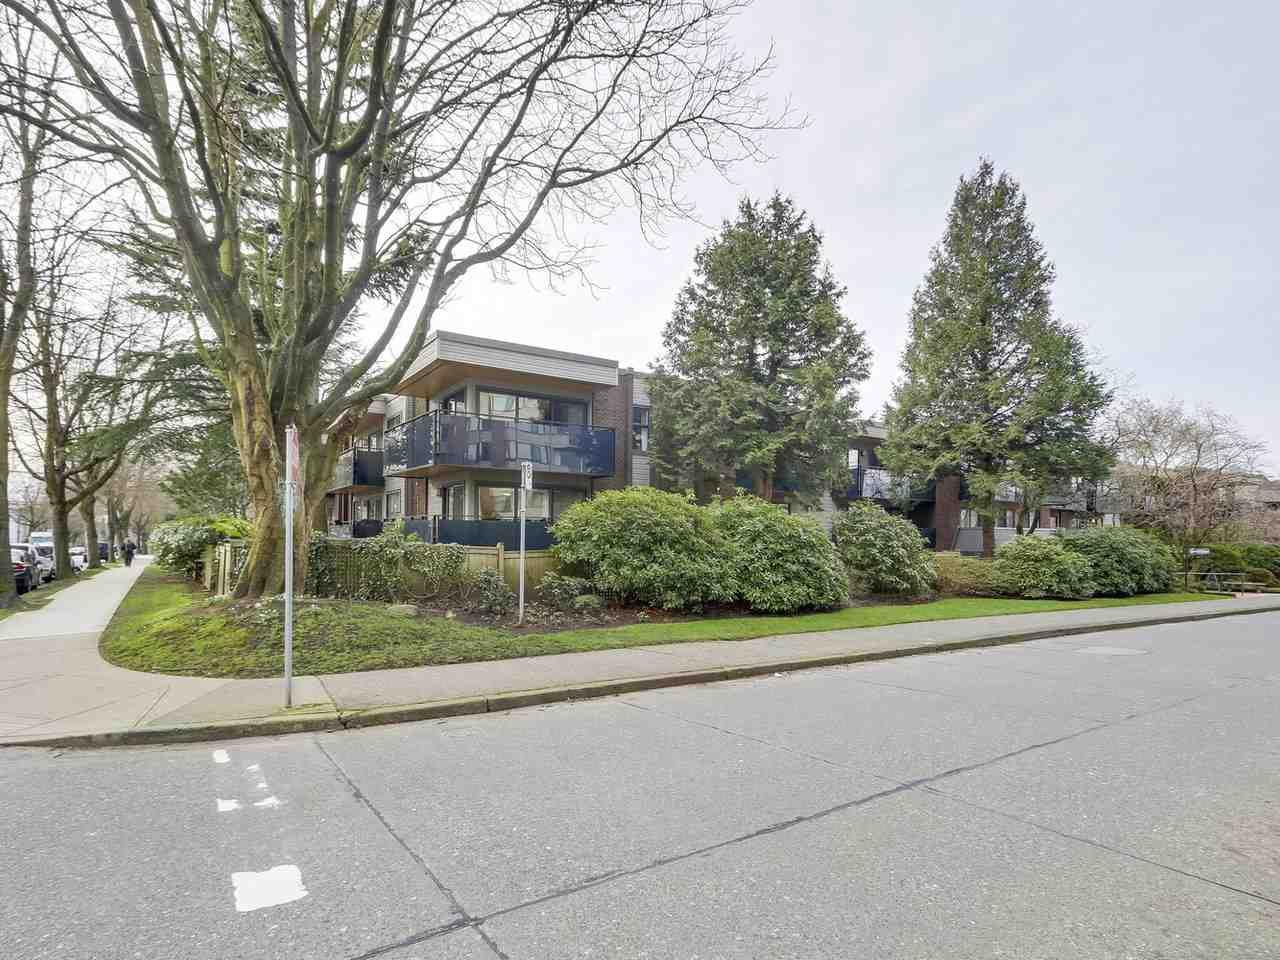 Main Photo: 105 2416 W 3RD Avenue in Vancouver: Kitsilano Condo for sale (Vancouver West)  : MLS®# R2239626